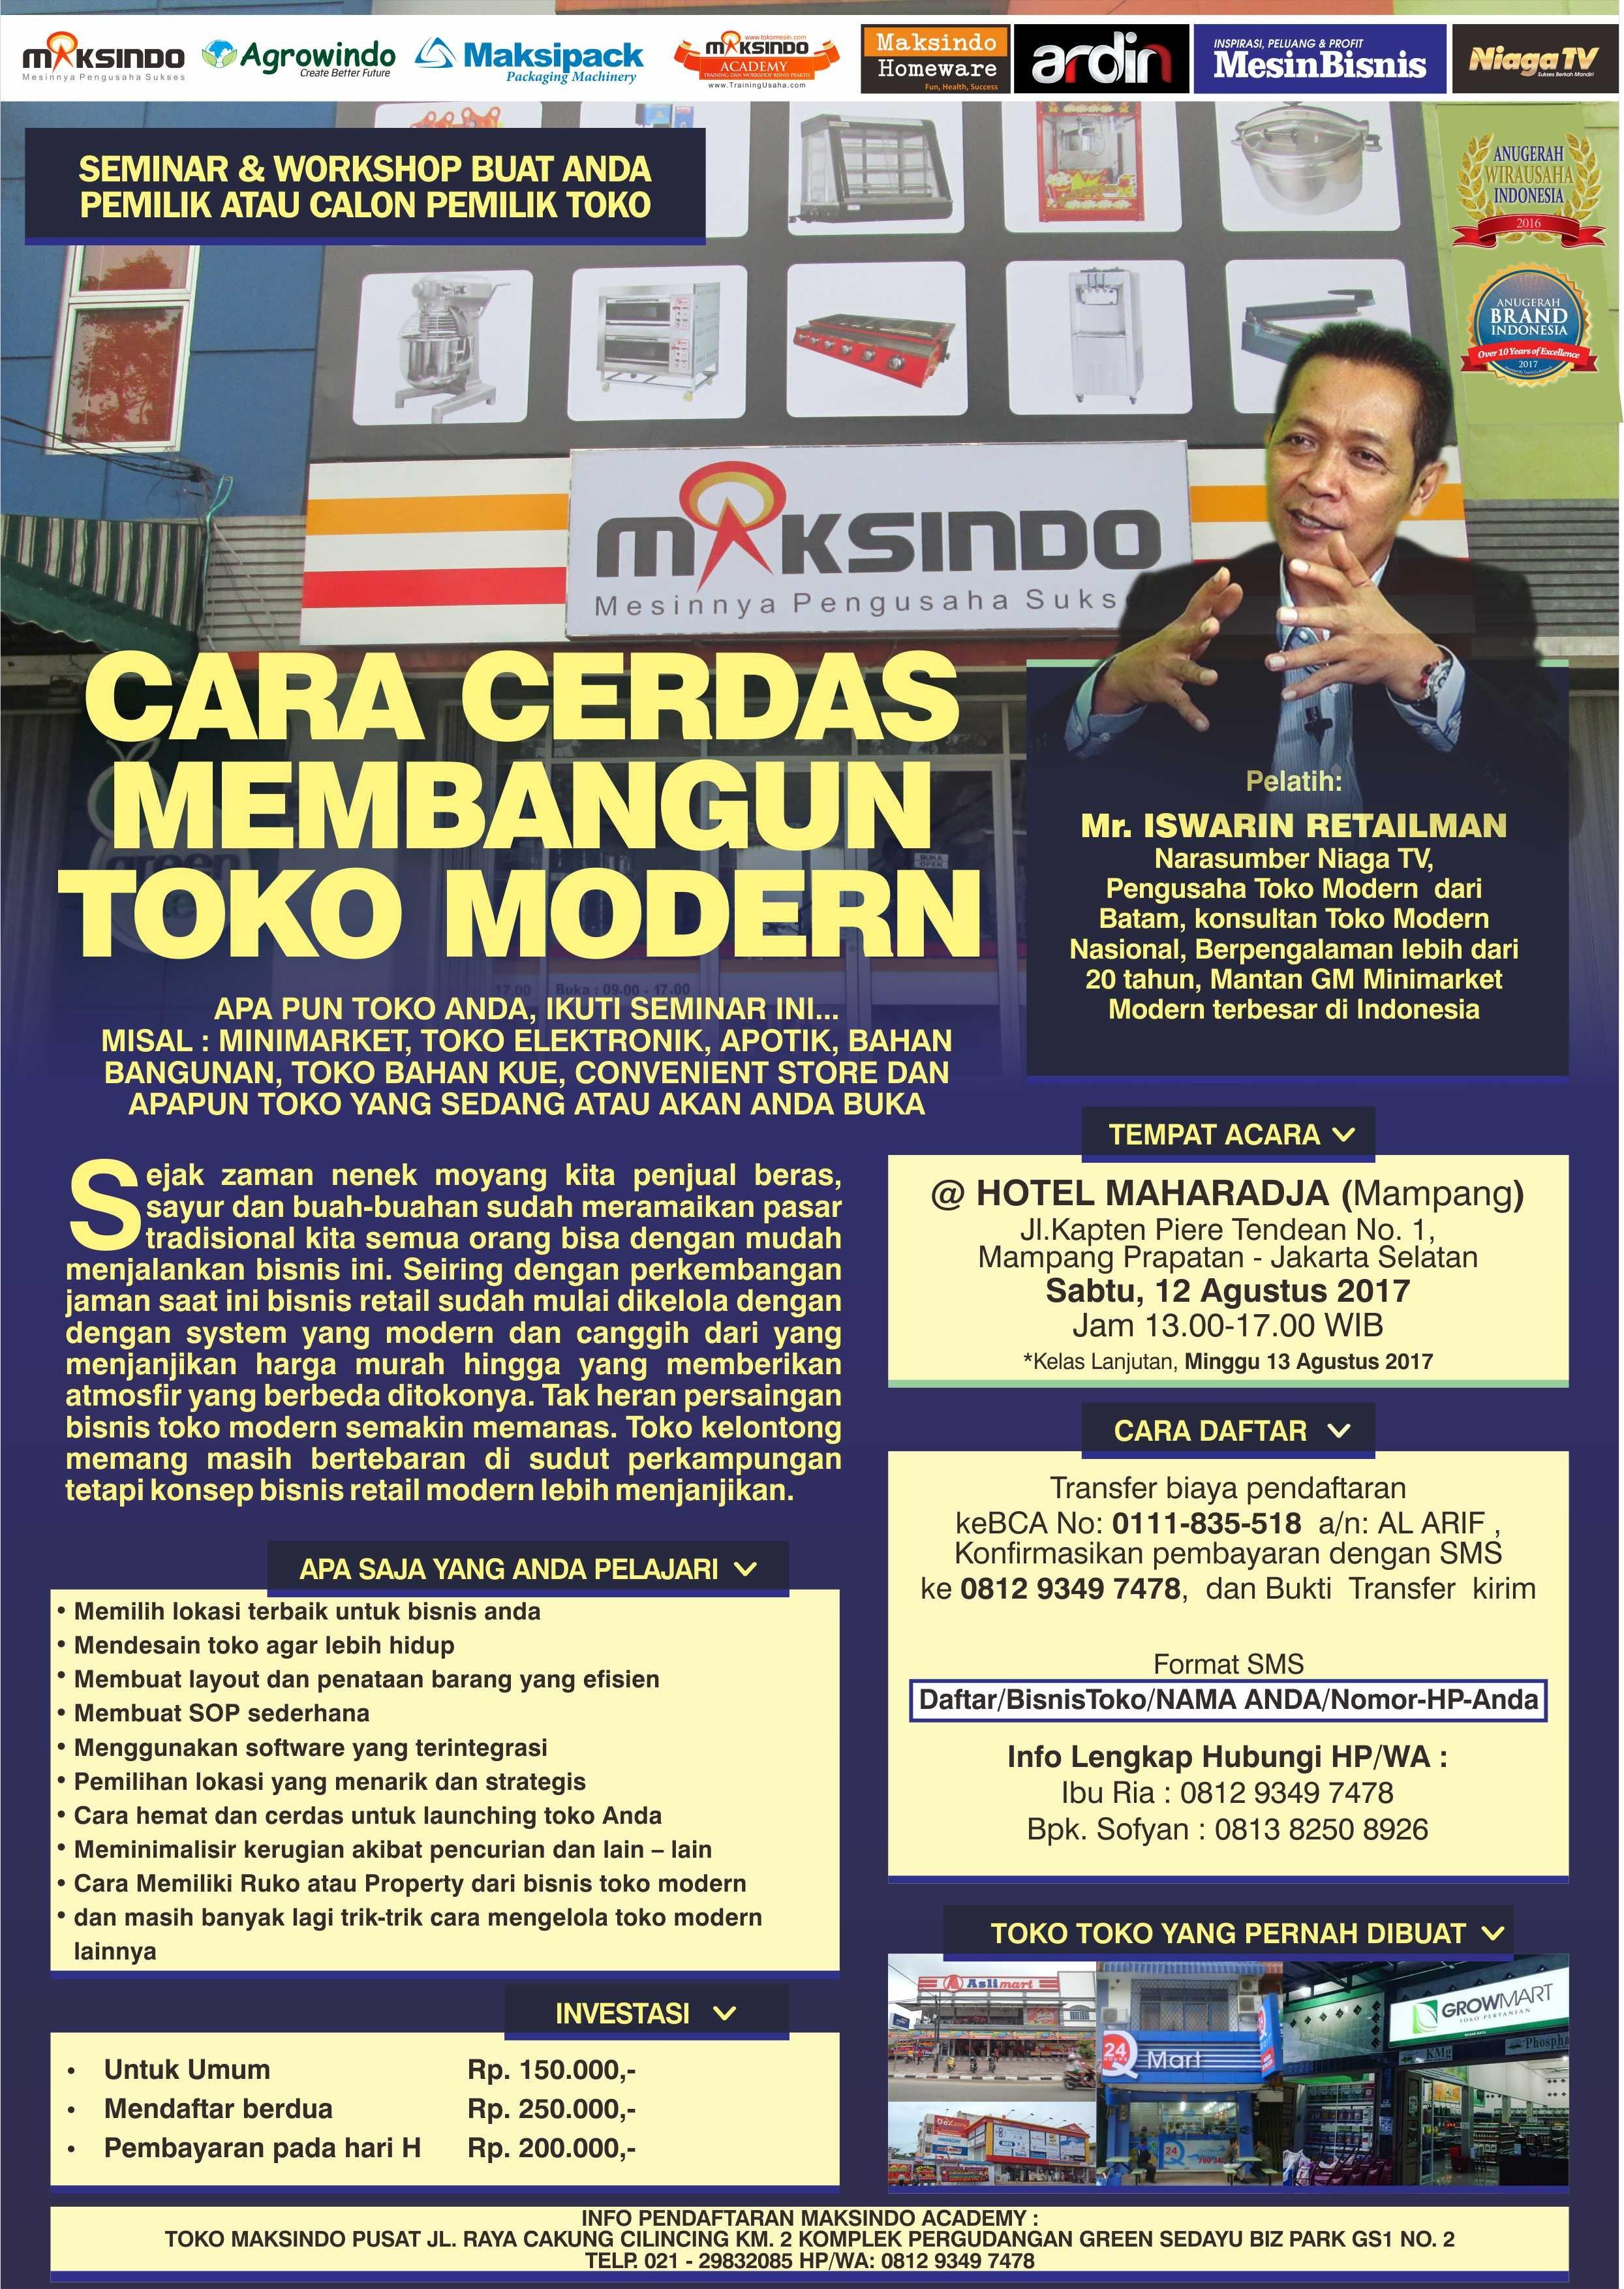 Seminar Cara Cerdas Membangun Toko Modern, 12 Agustus 2017